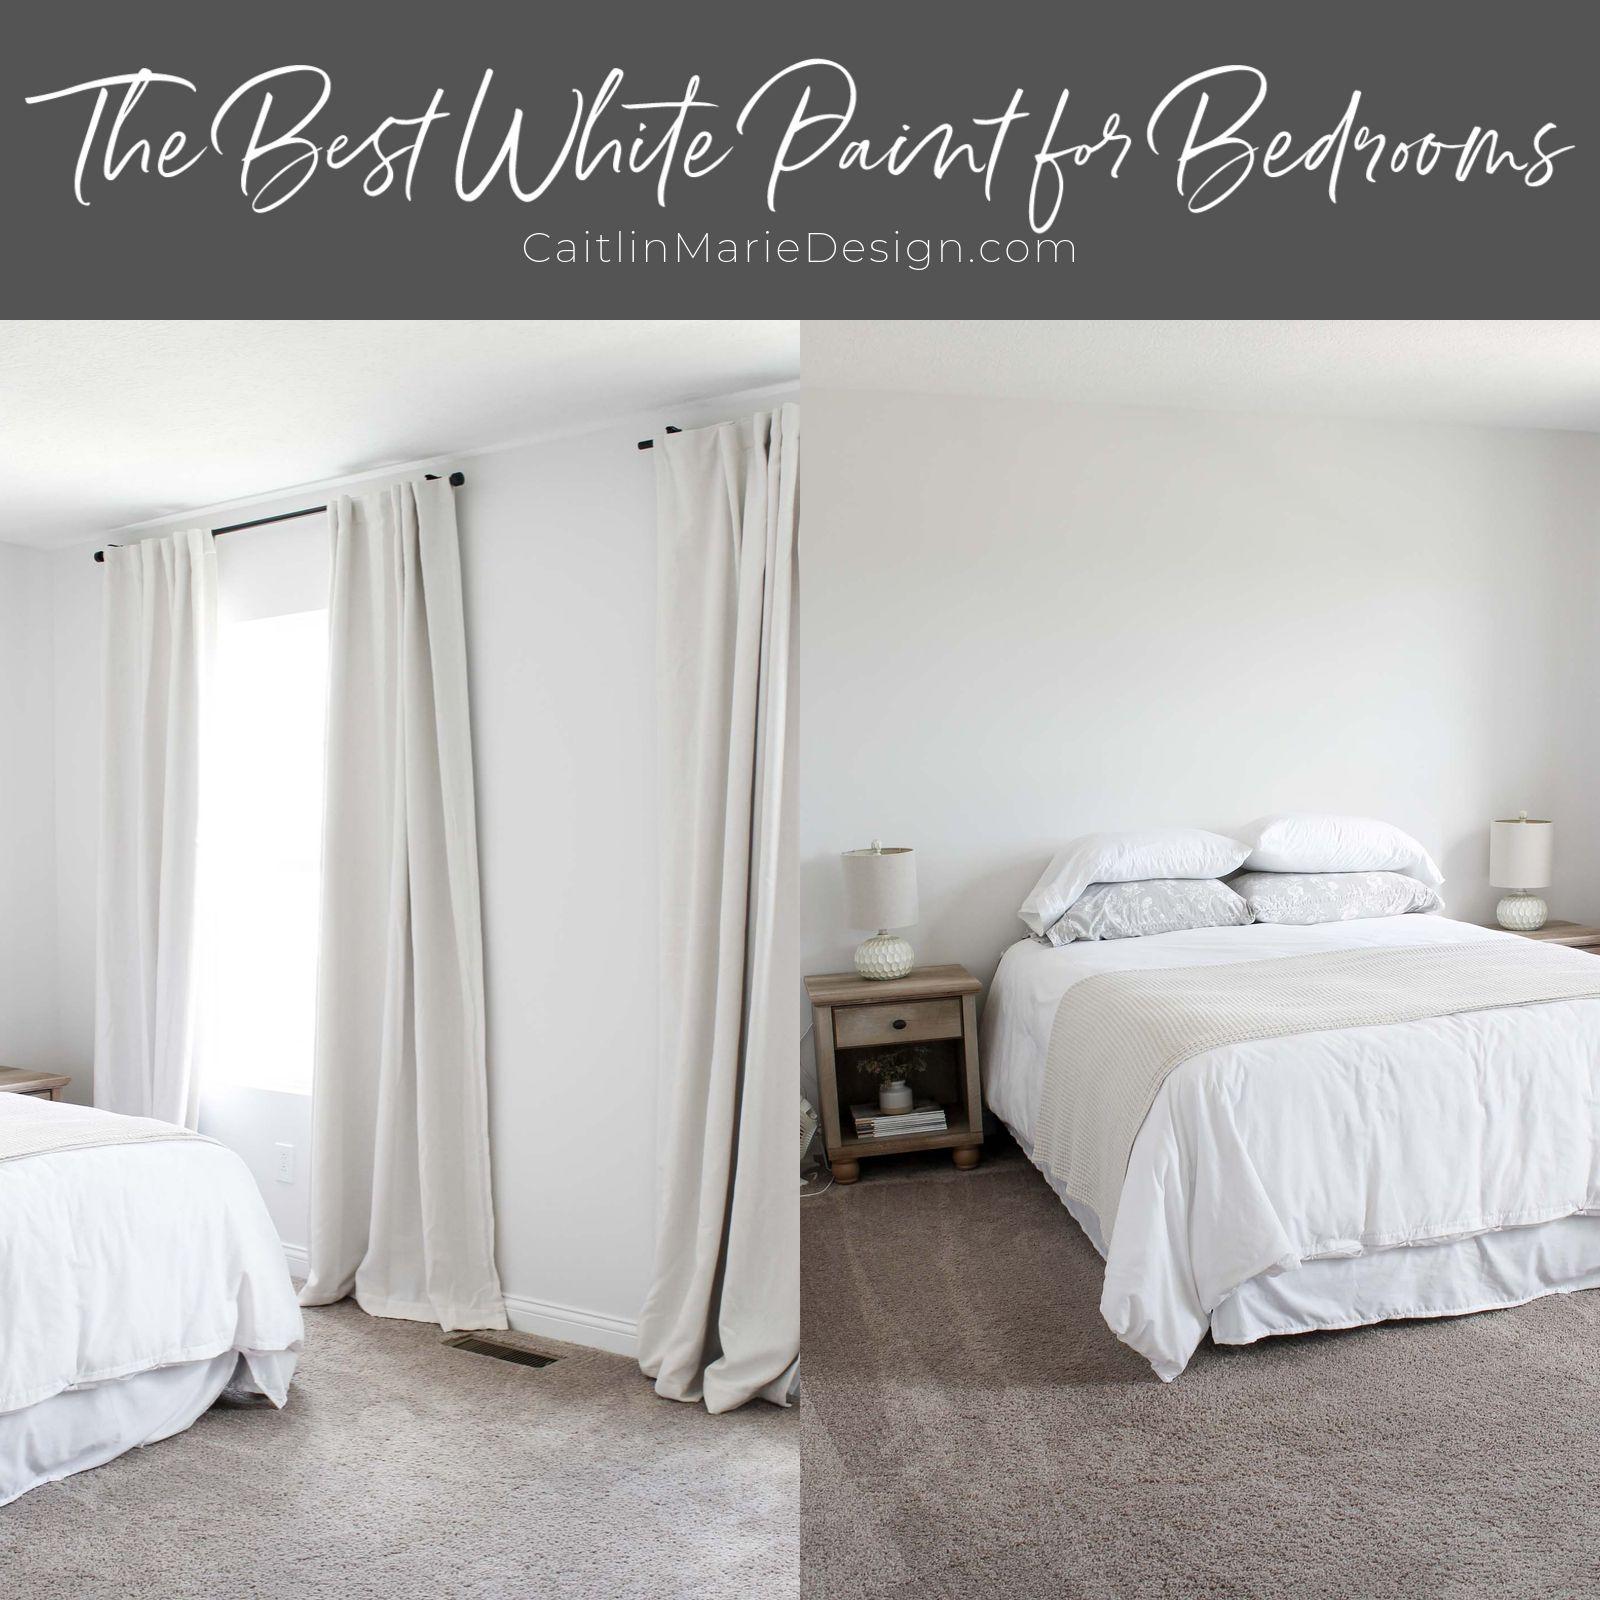 The Best White Paint for Bedrooms | choosing white paint colors, warm undertones